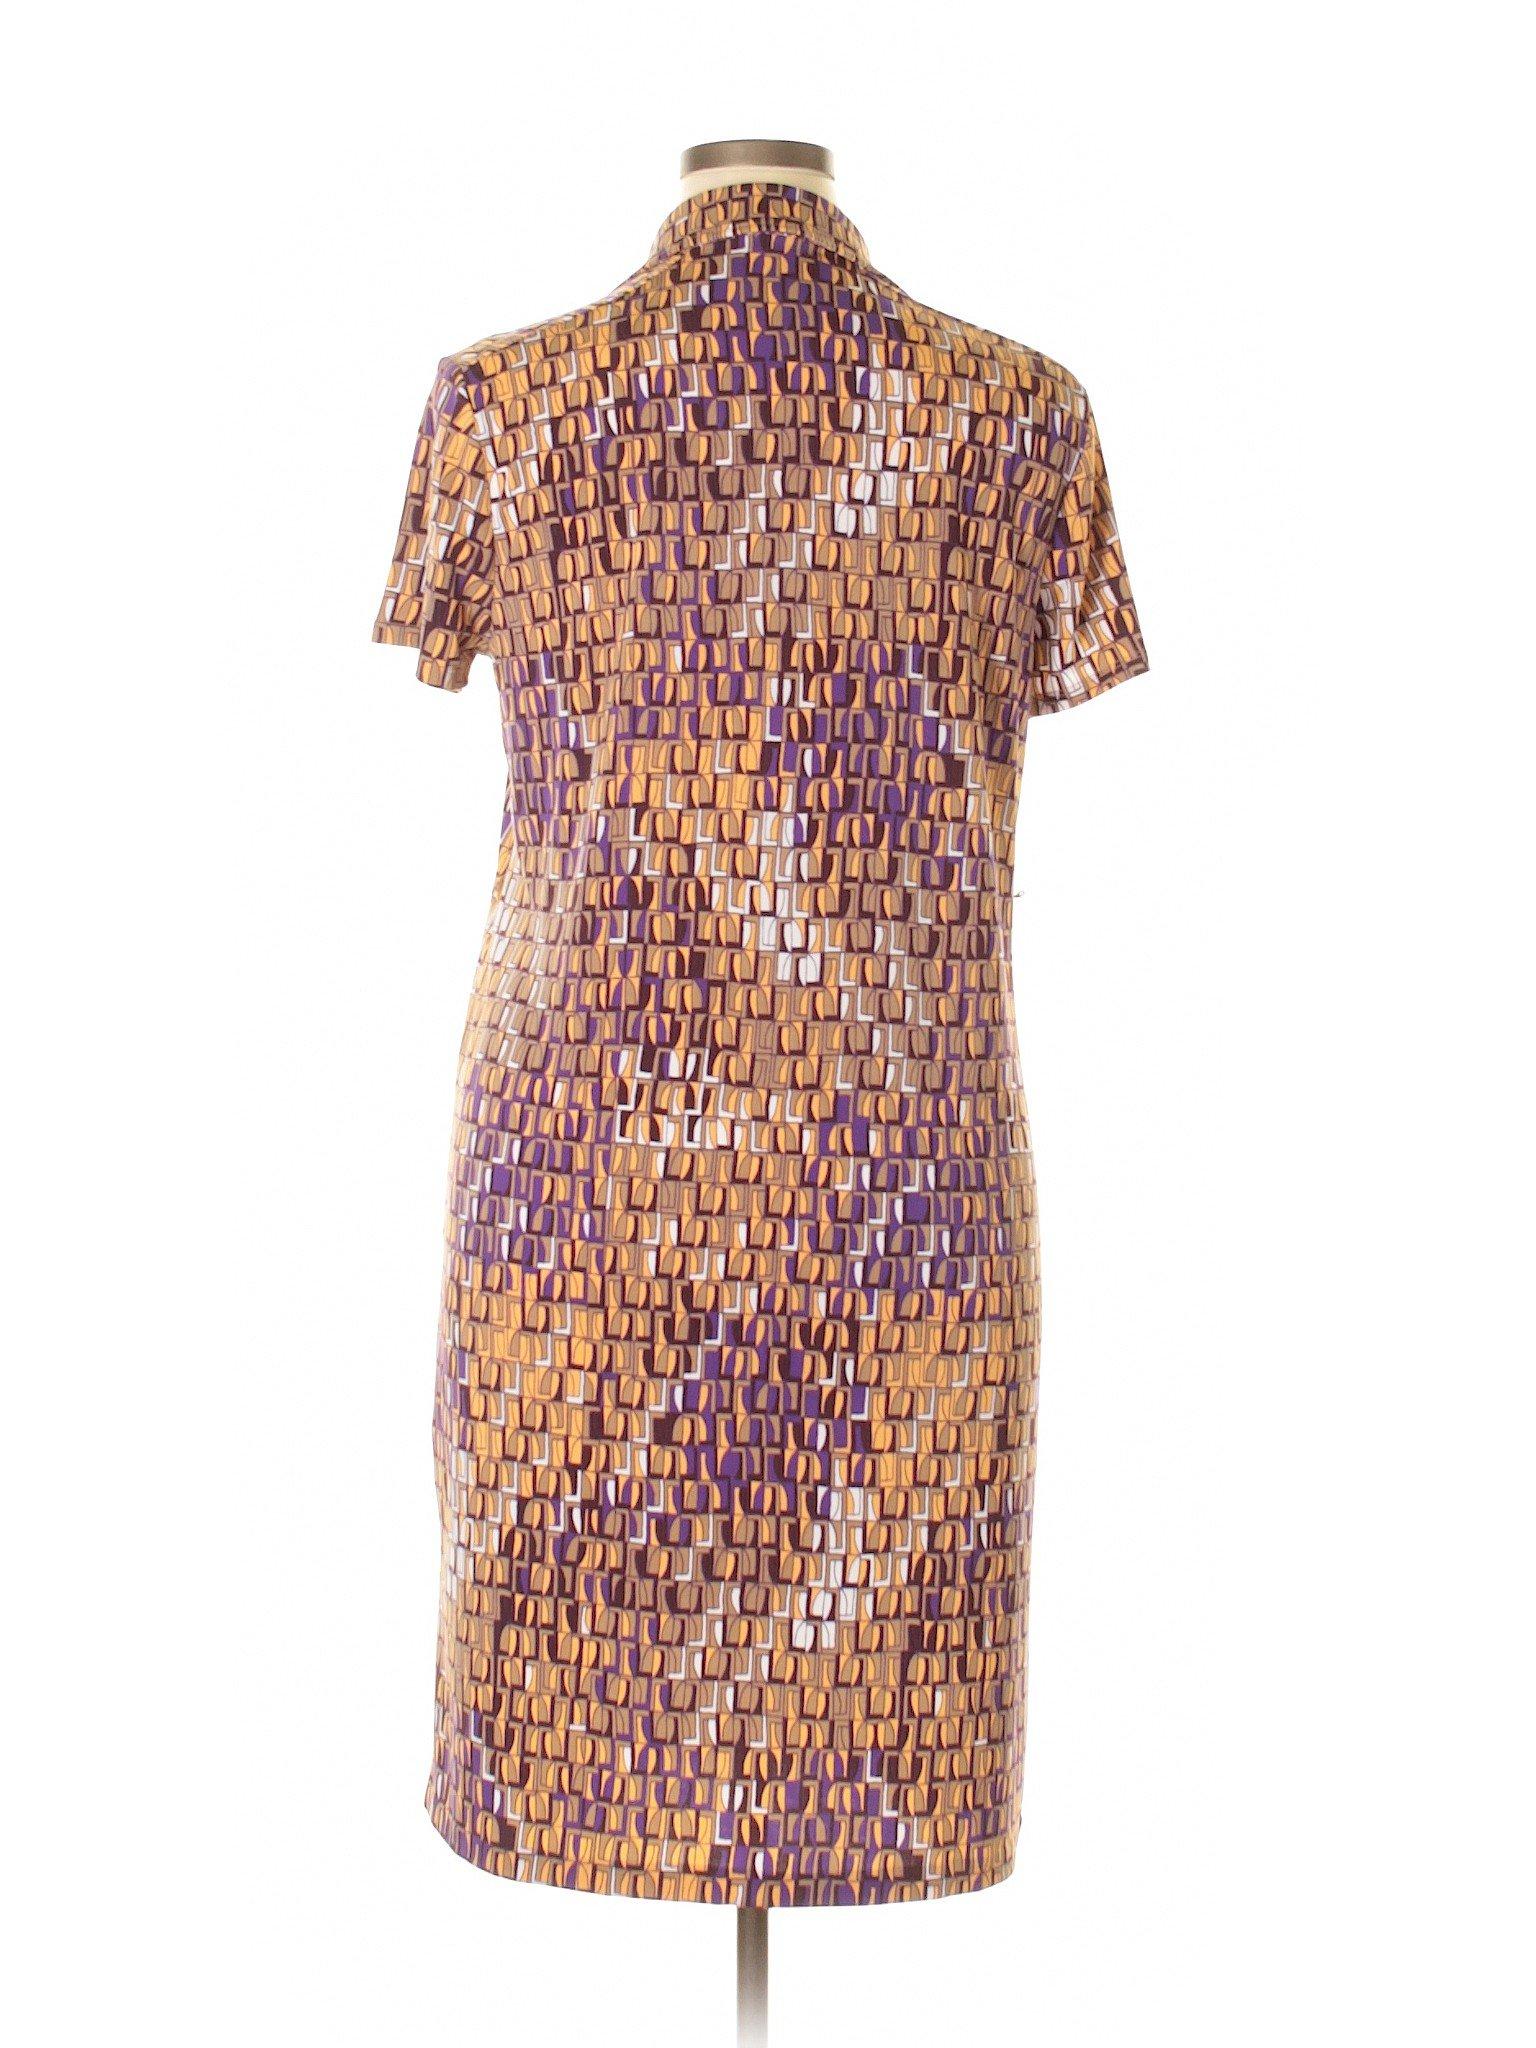 Boutique Casual Dress Anne winter Klein prwqrX8